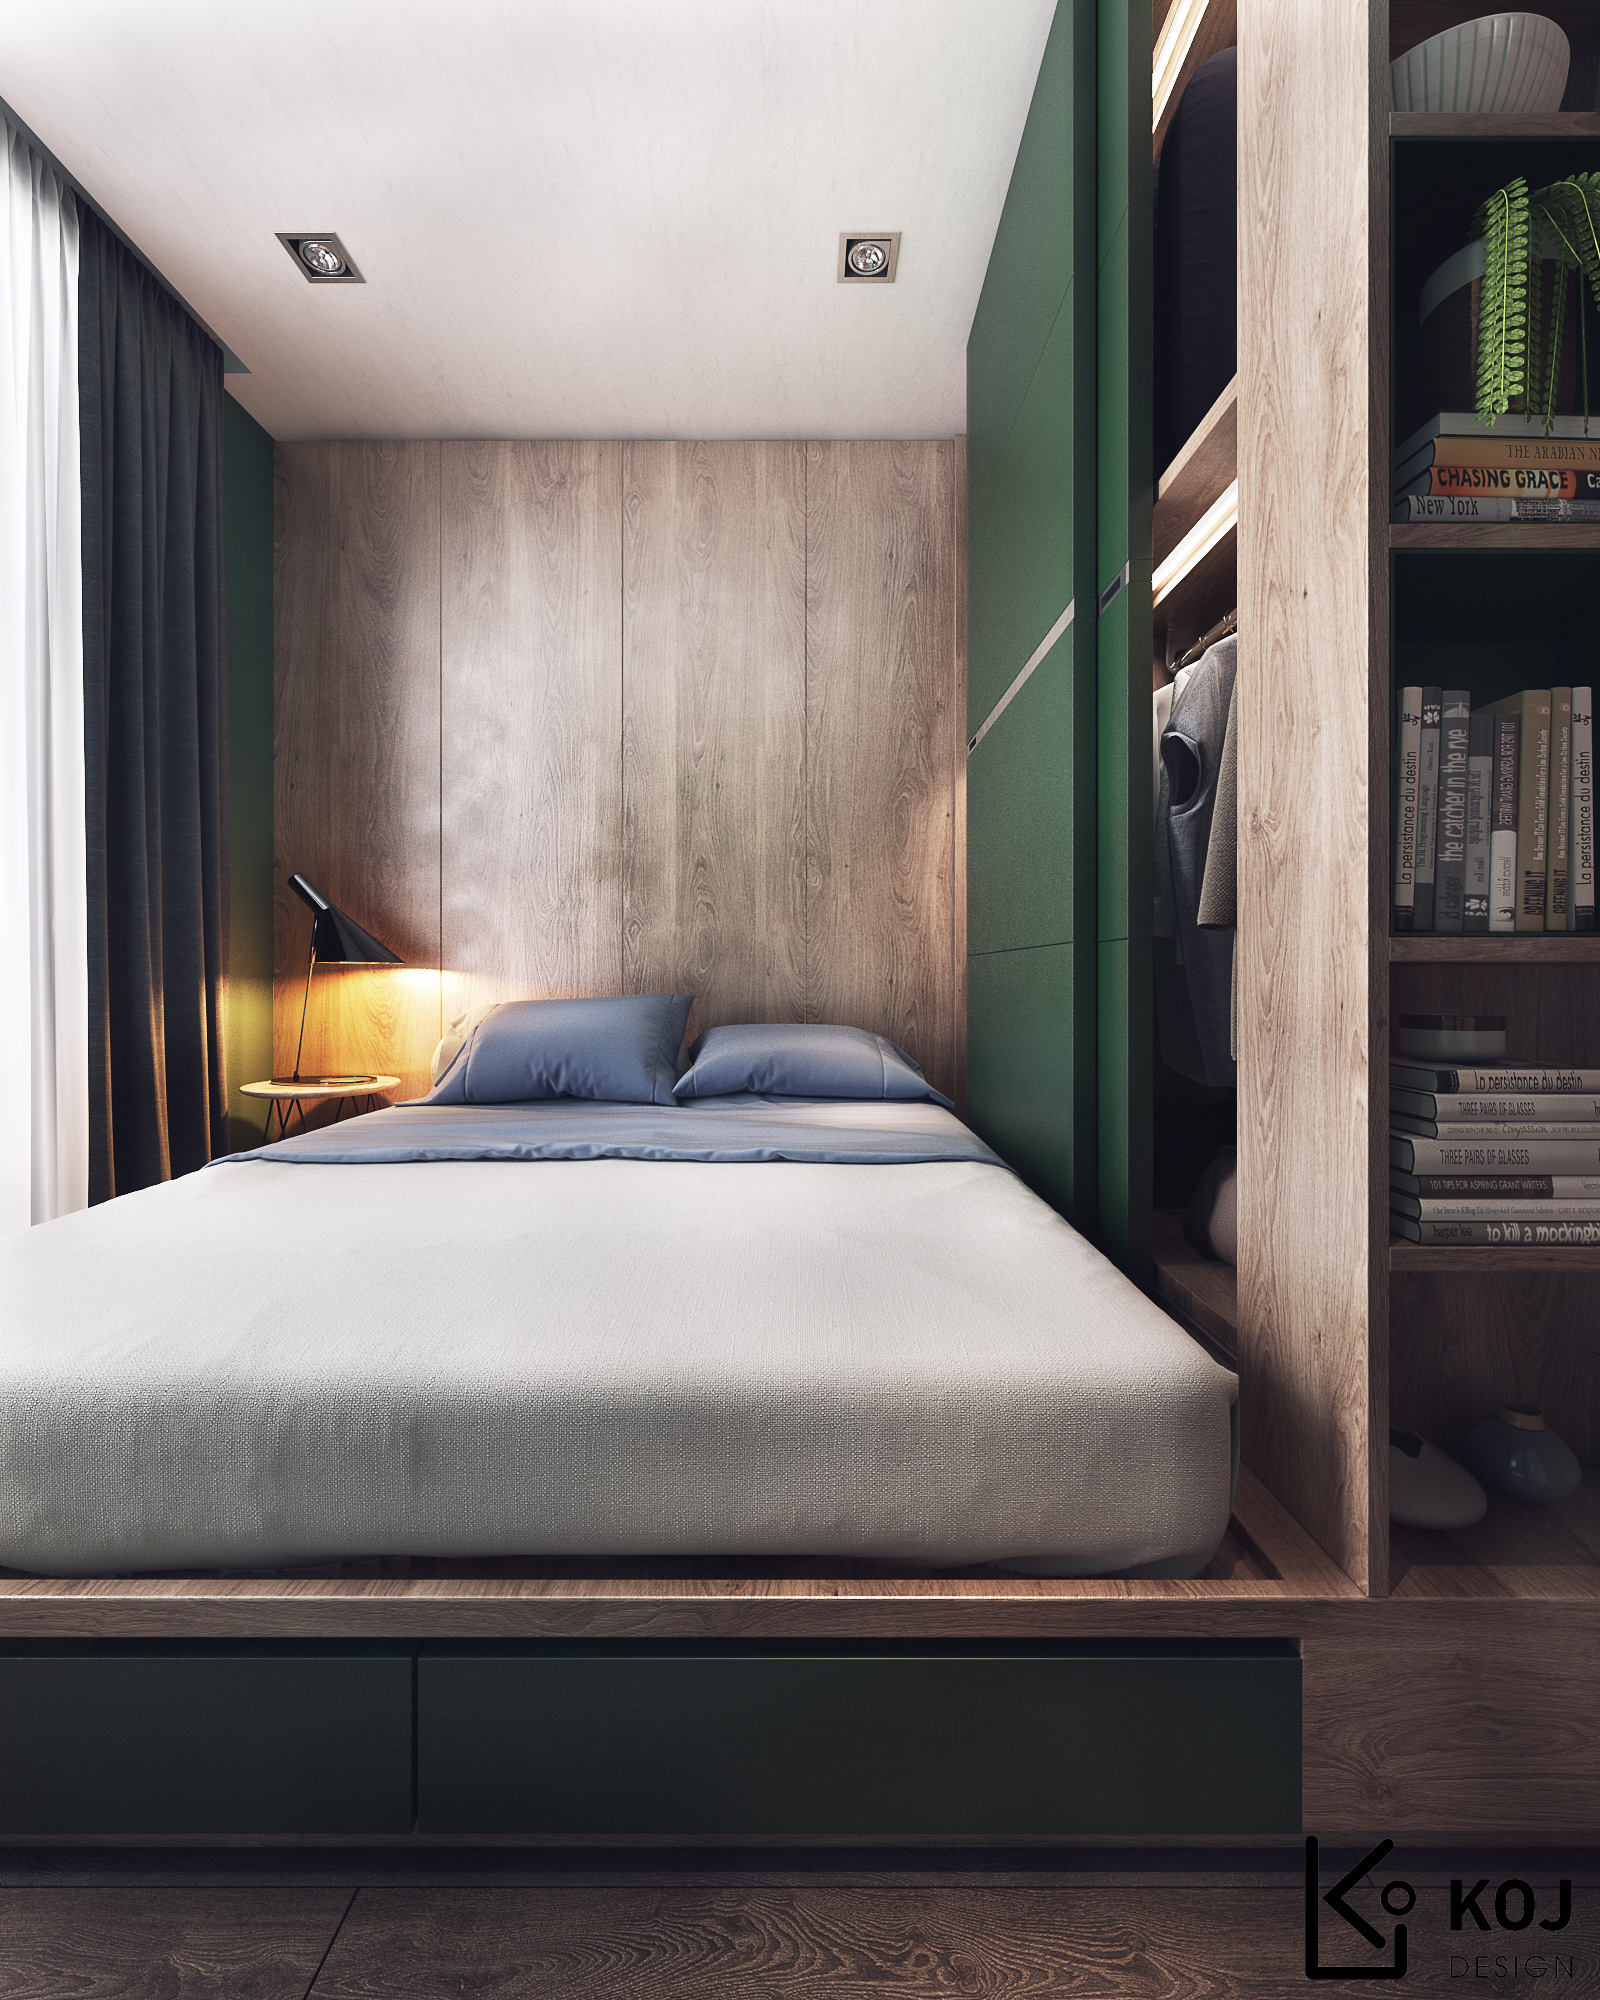 Tresor_Green Apartment!! On Behance